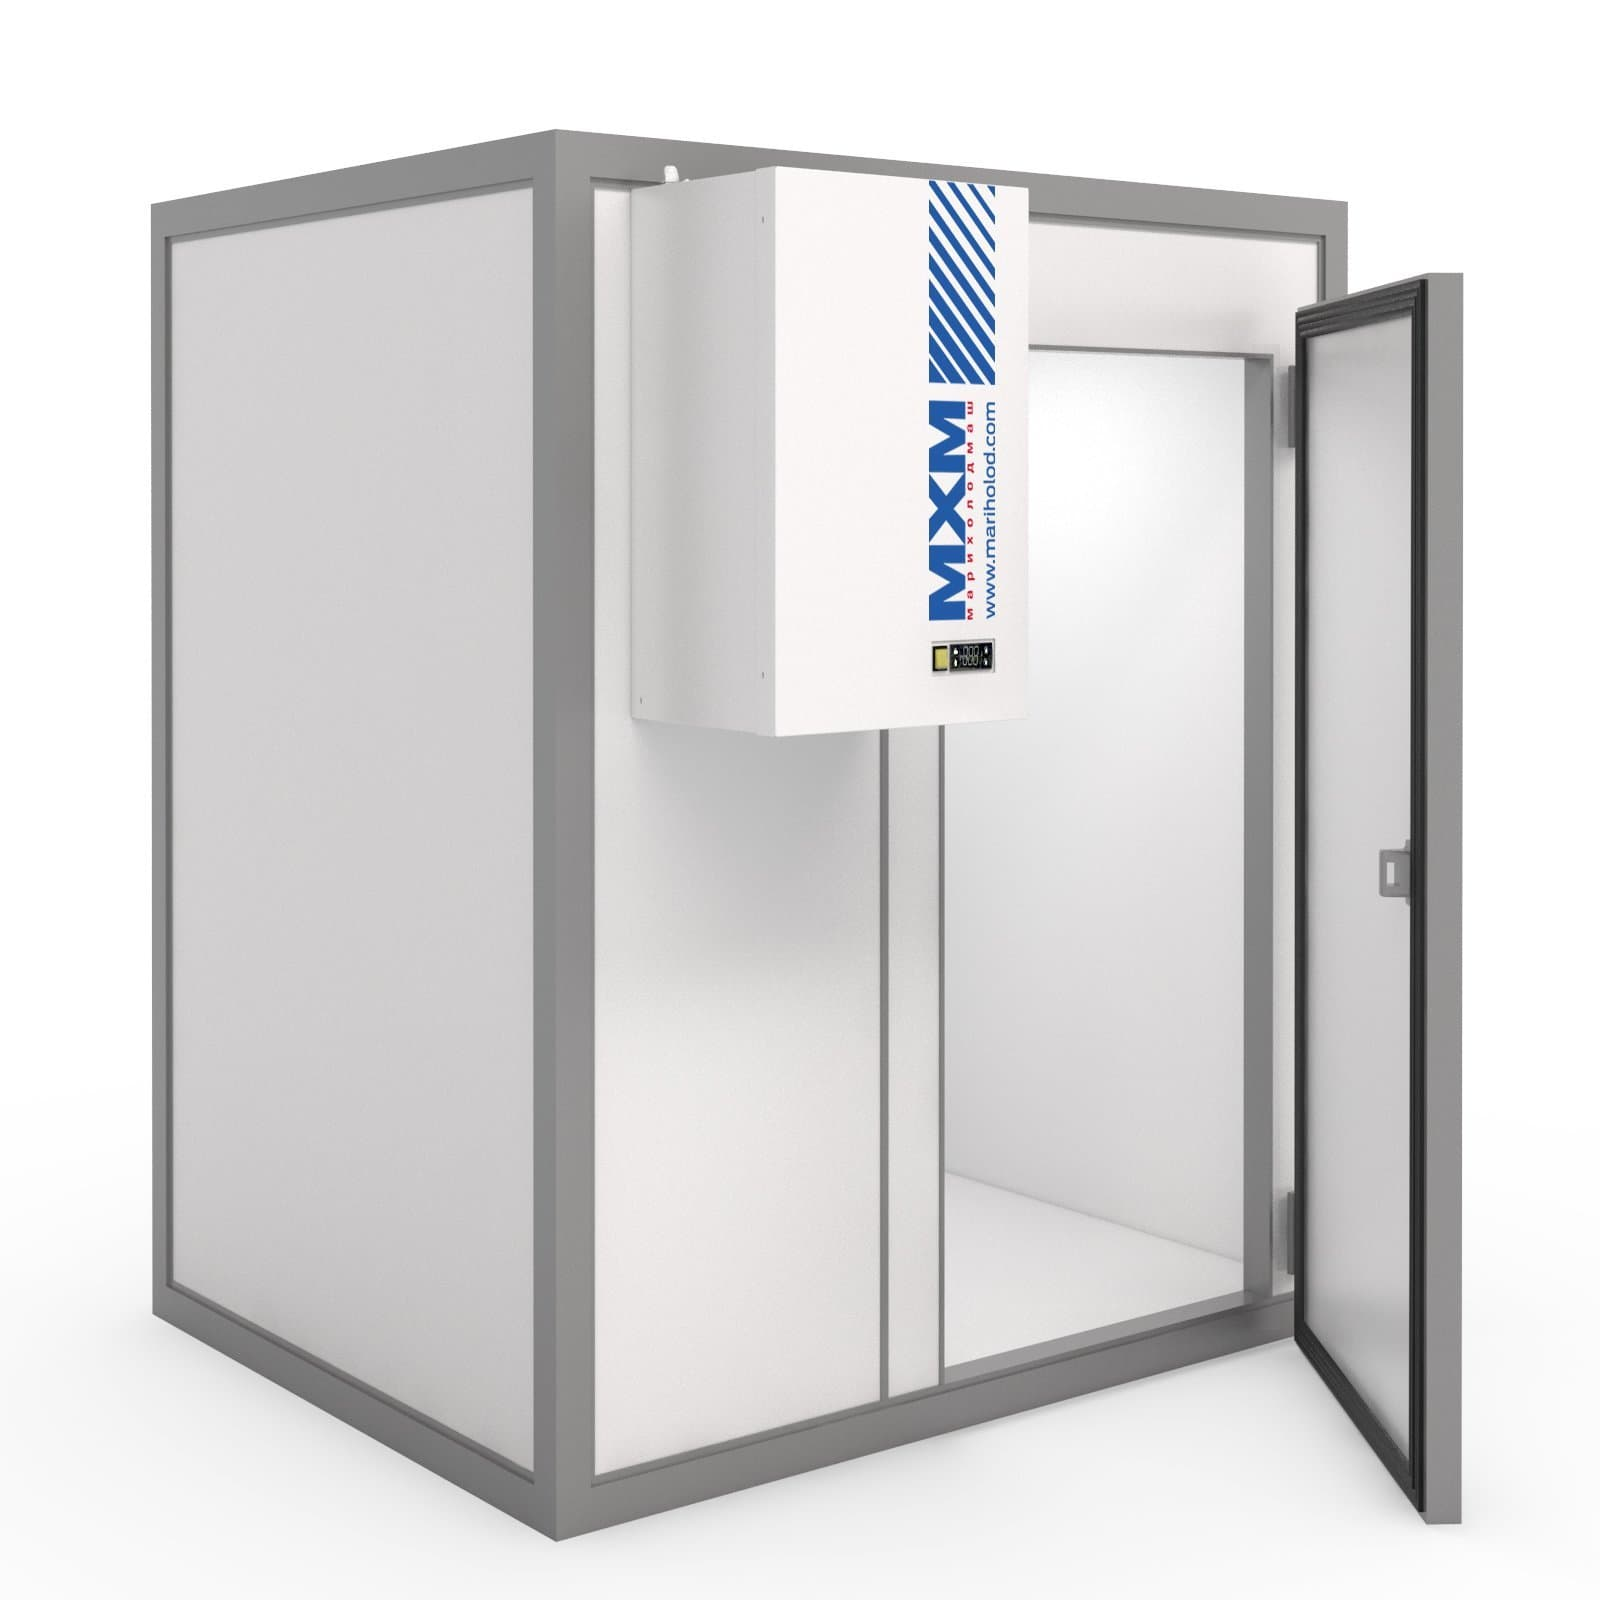 Камера холодильная КХН-82,94 (2560×13660×2720 мм)